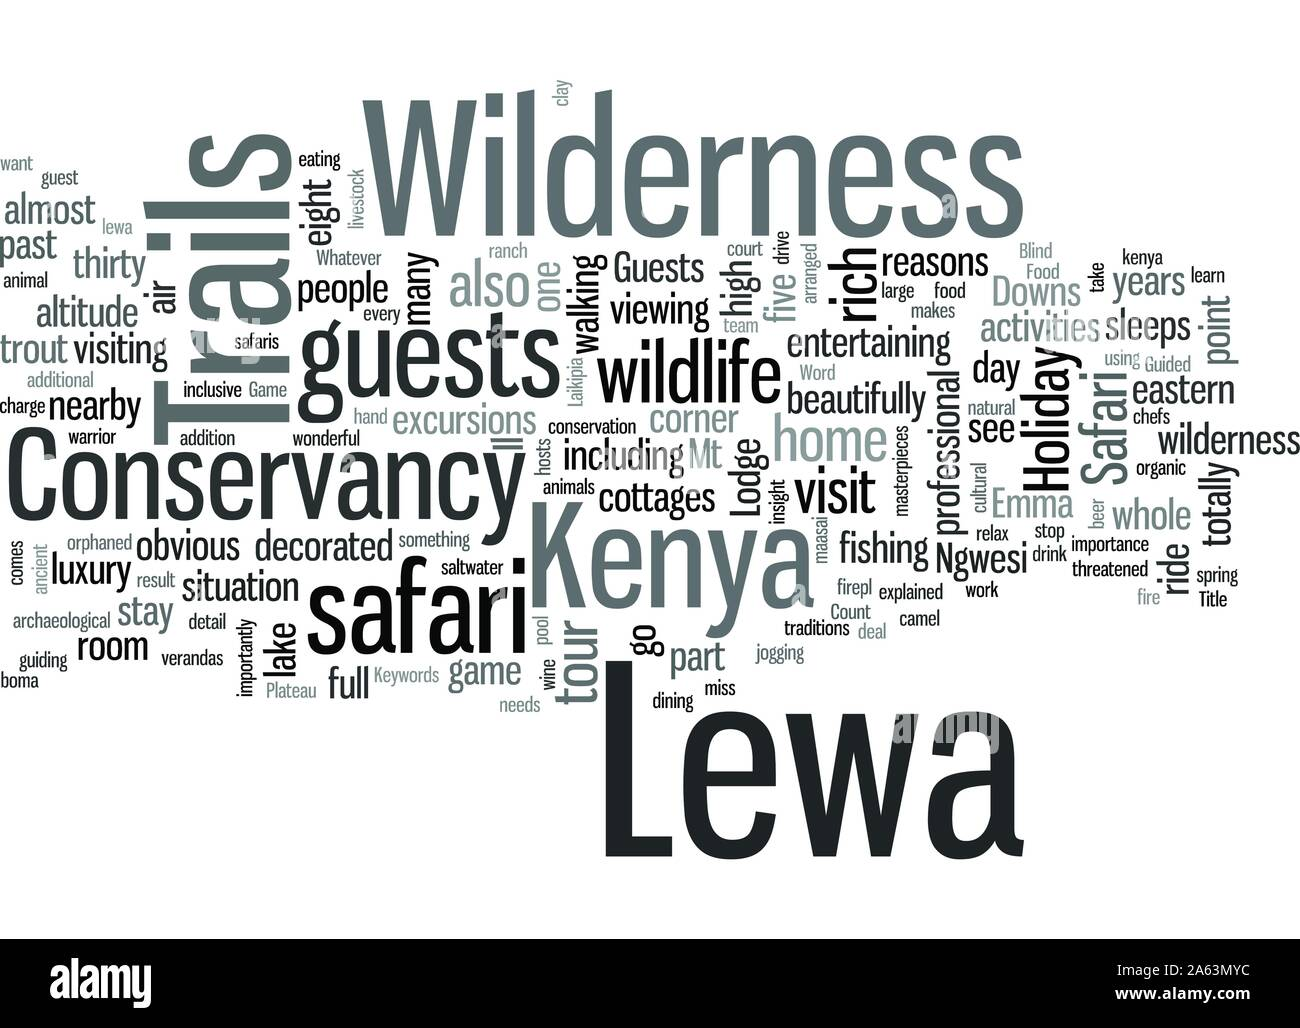 Lewa Wilderness Trails Laikipia Plateau Kenya Stock Vector